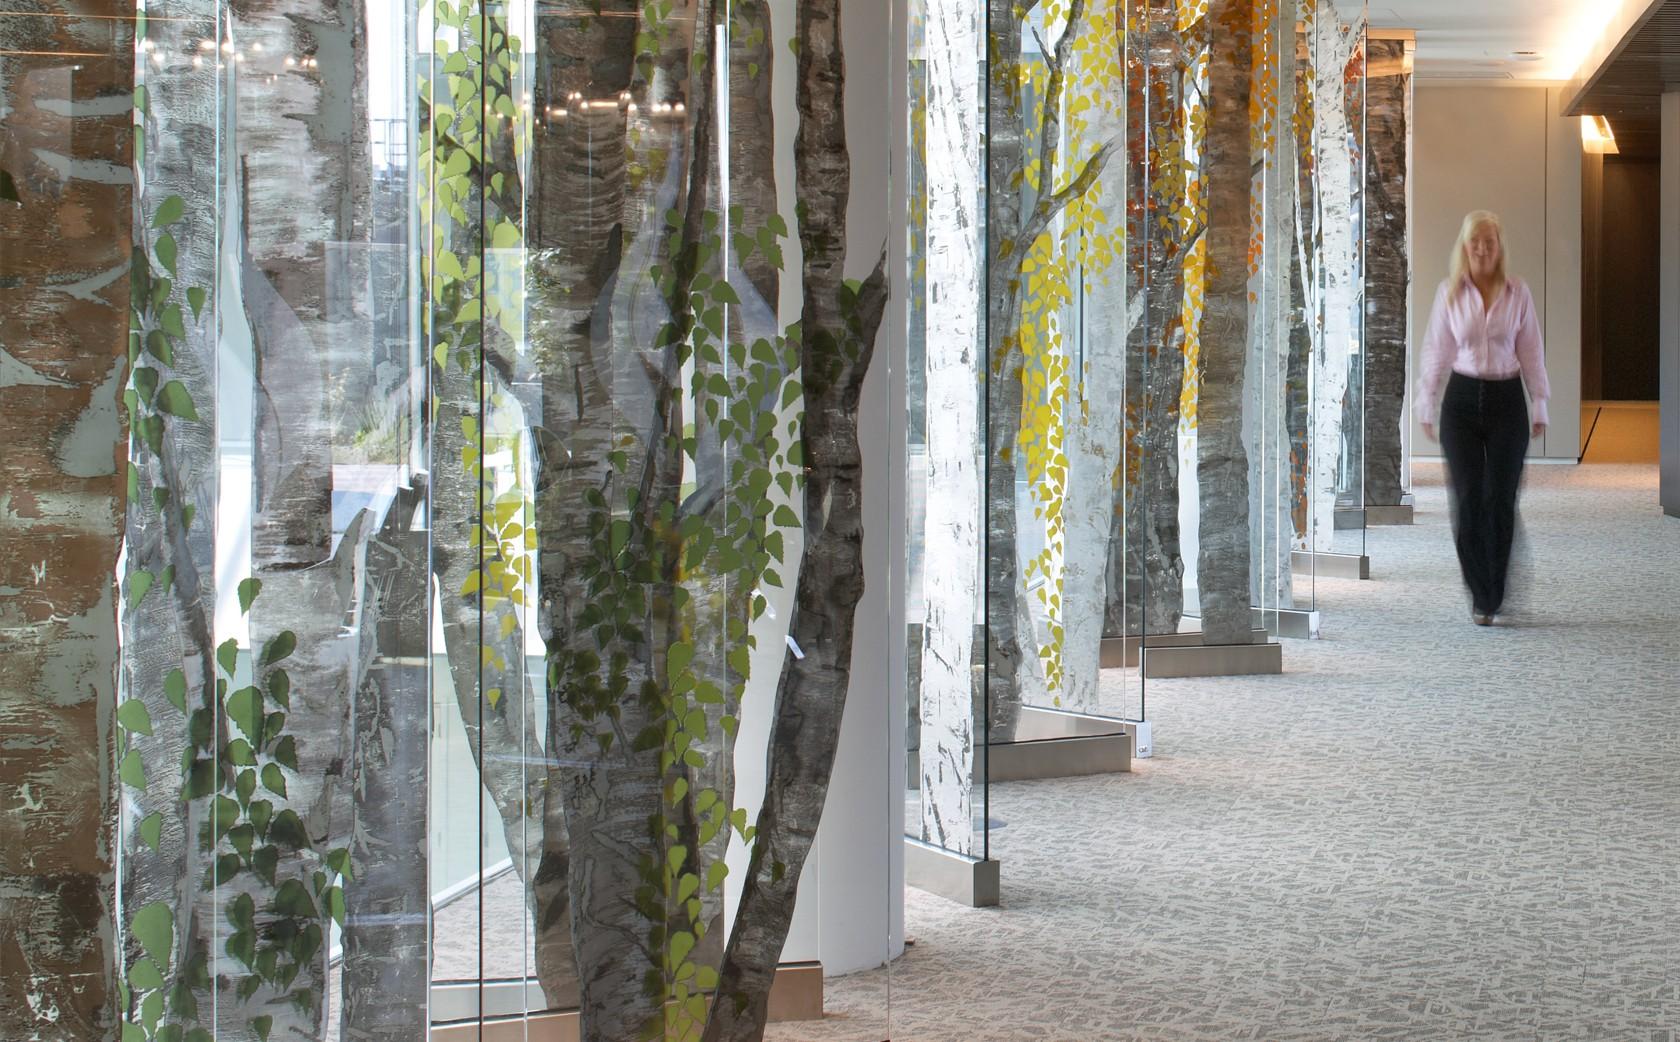 Architectural Glass Sculpture Birch Tree Walk - Autumn Season